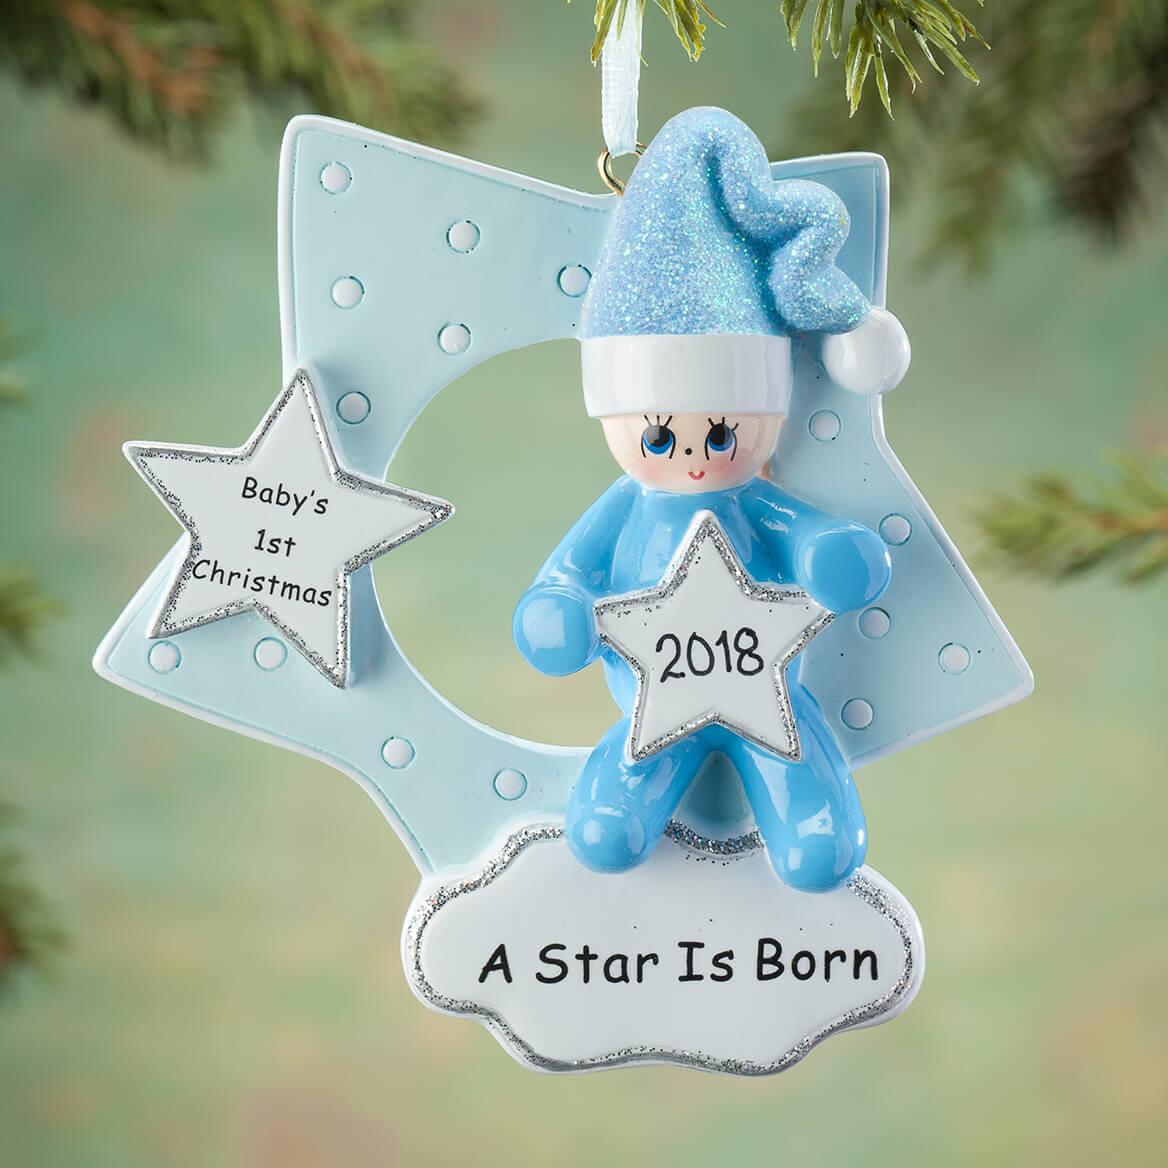 c206ae420ad ... Personalized A Star Is Born Ornament-364911